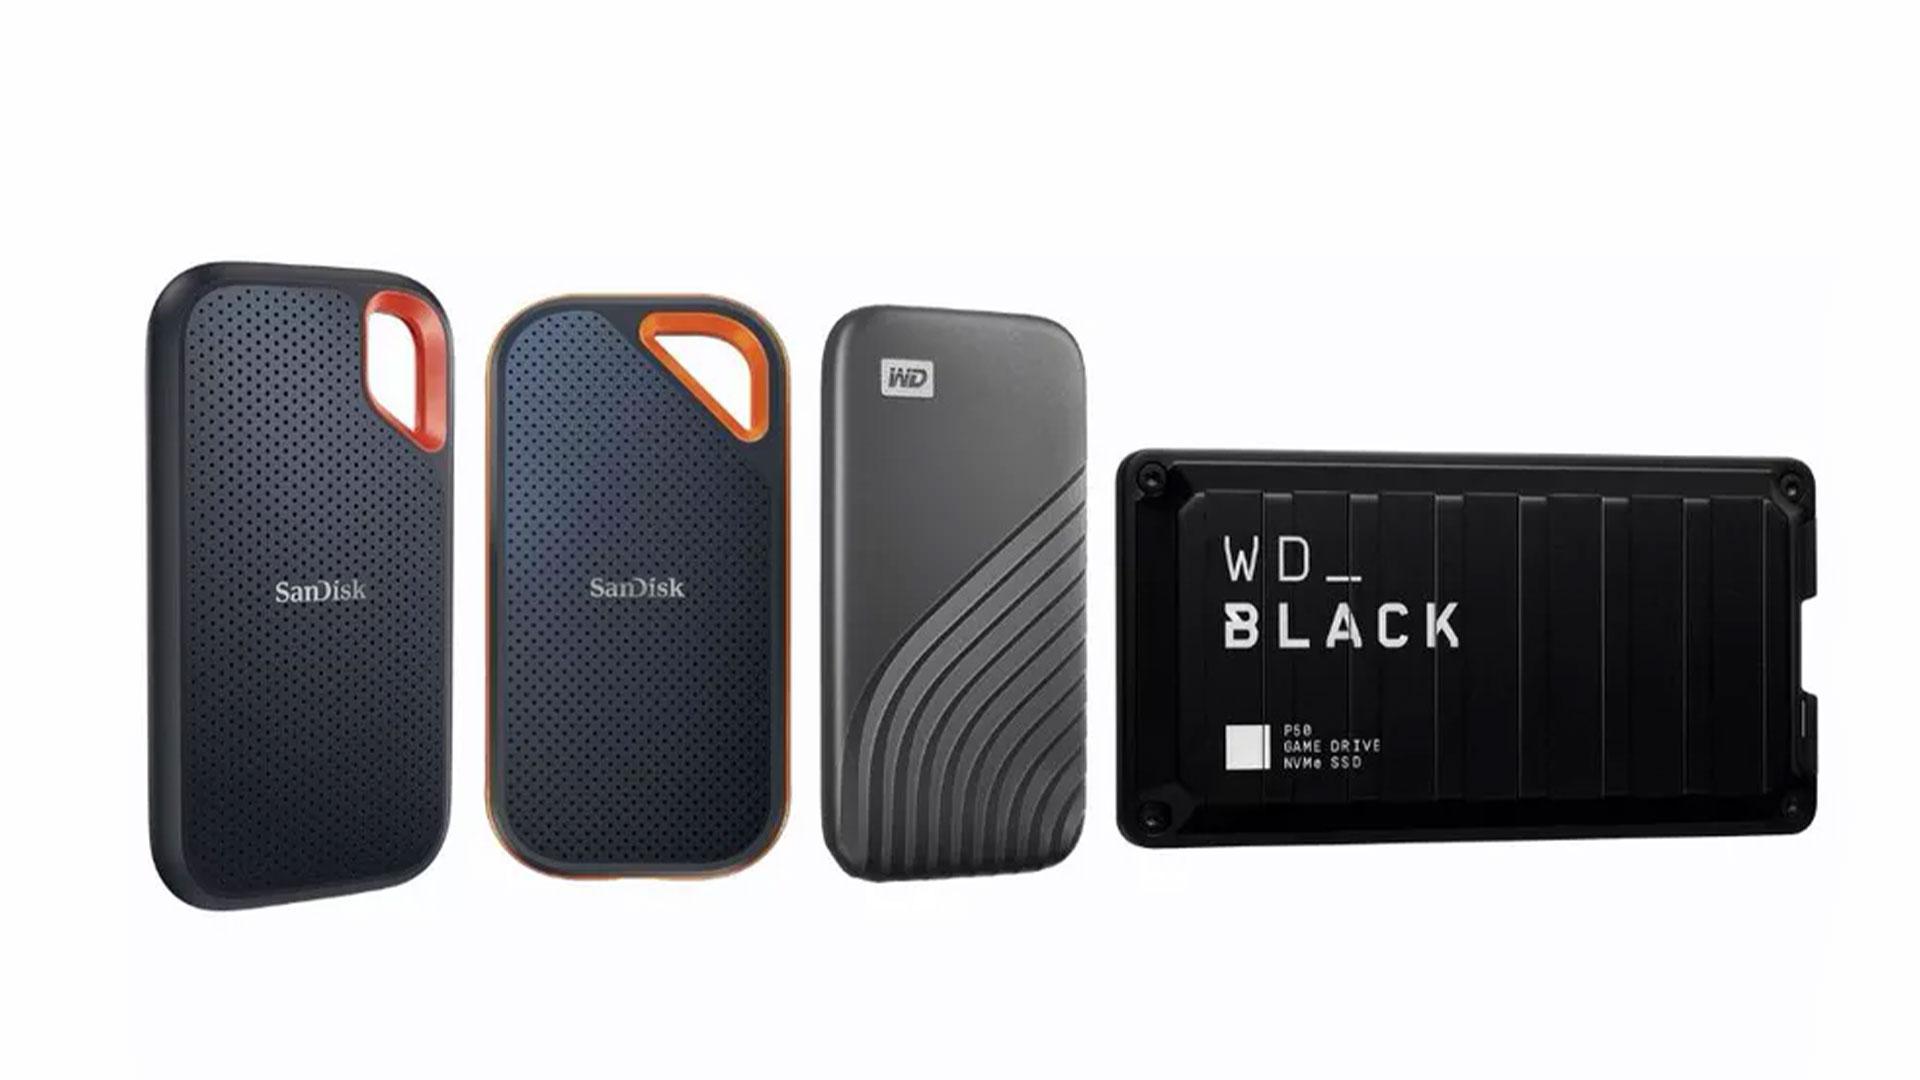 Western Digital 4TB Tasinabilir SSD'lerini Duyurdu 2